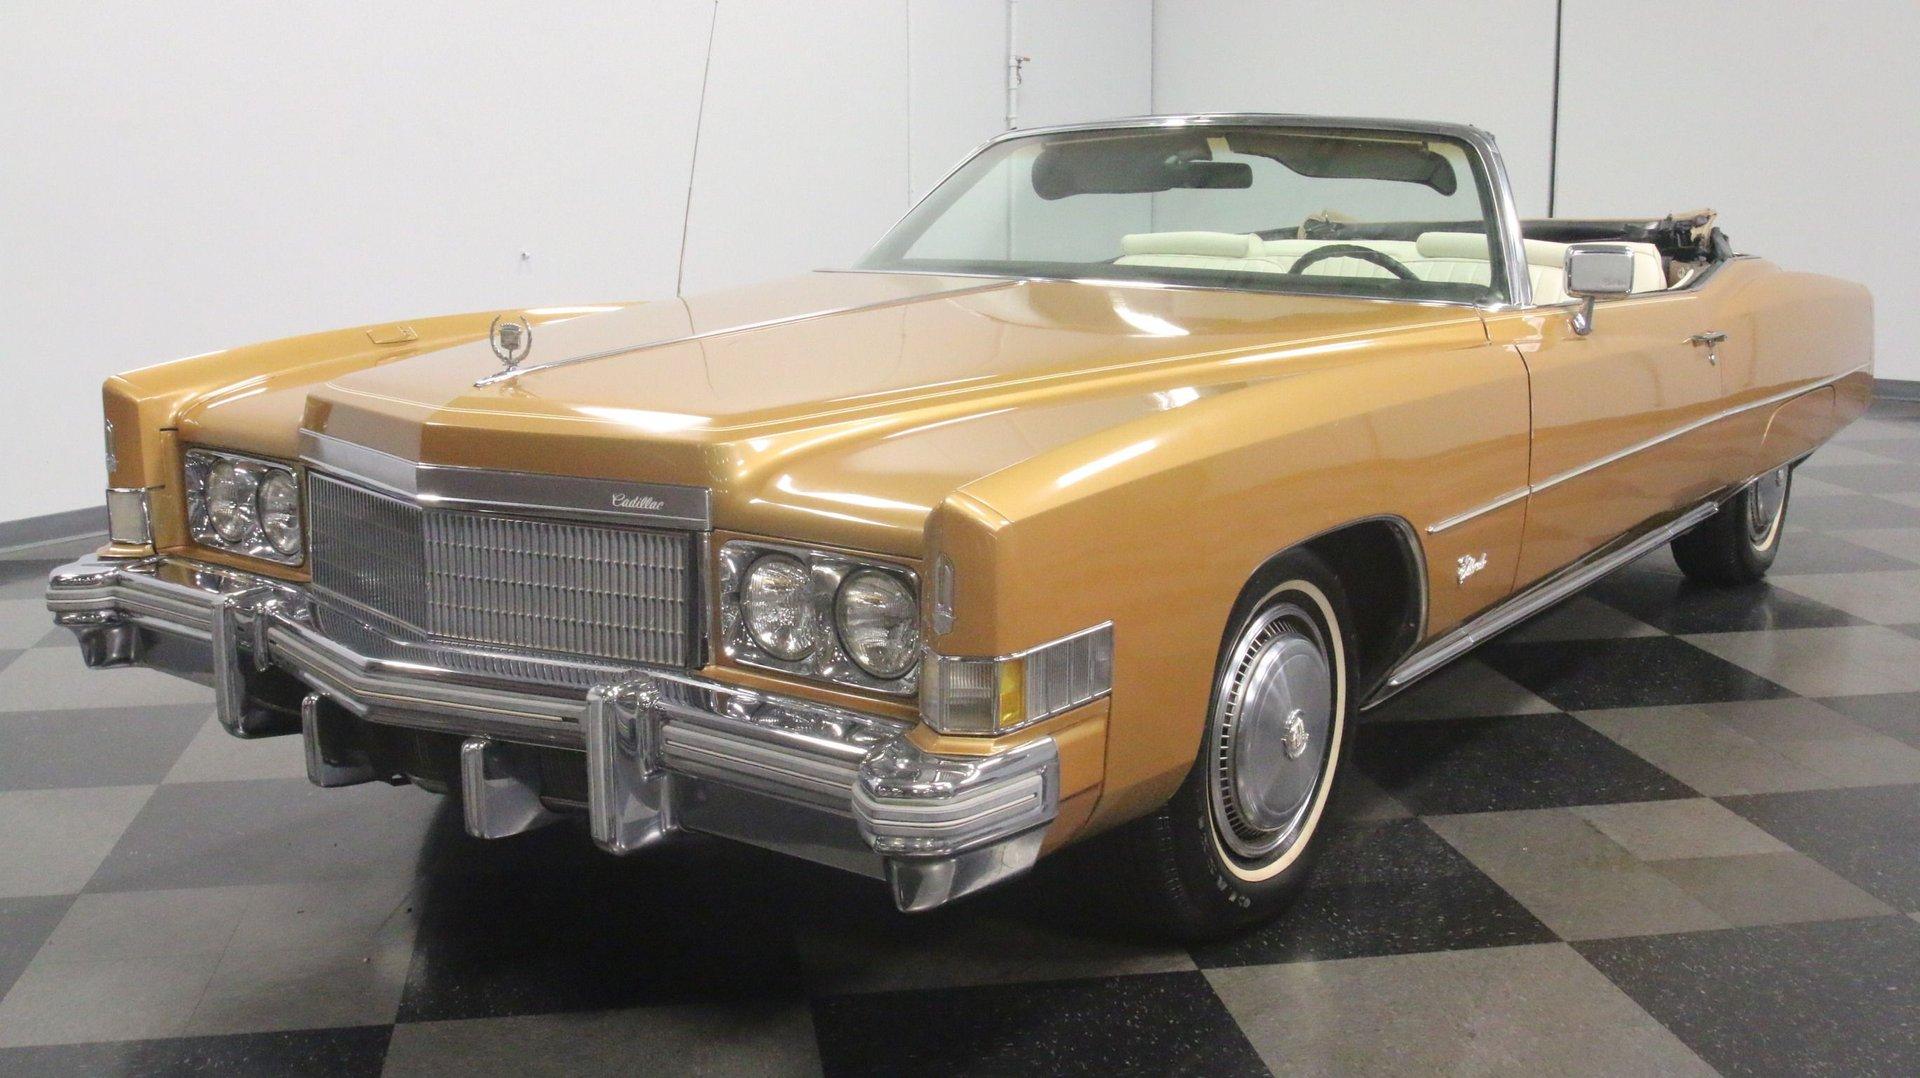 1974 Cadillac Eldorado | Streetside Classics - The Nation's Trusted